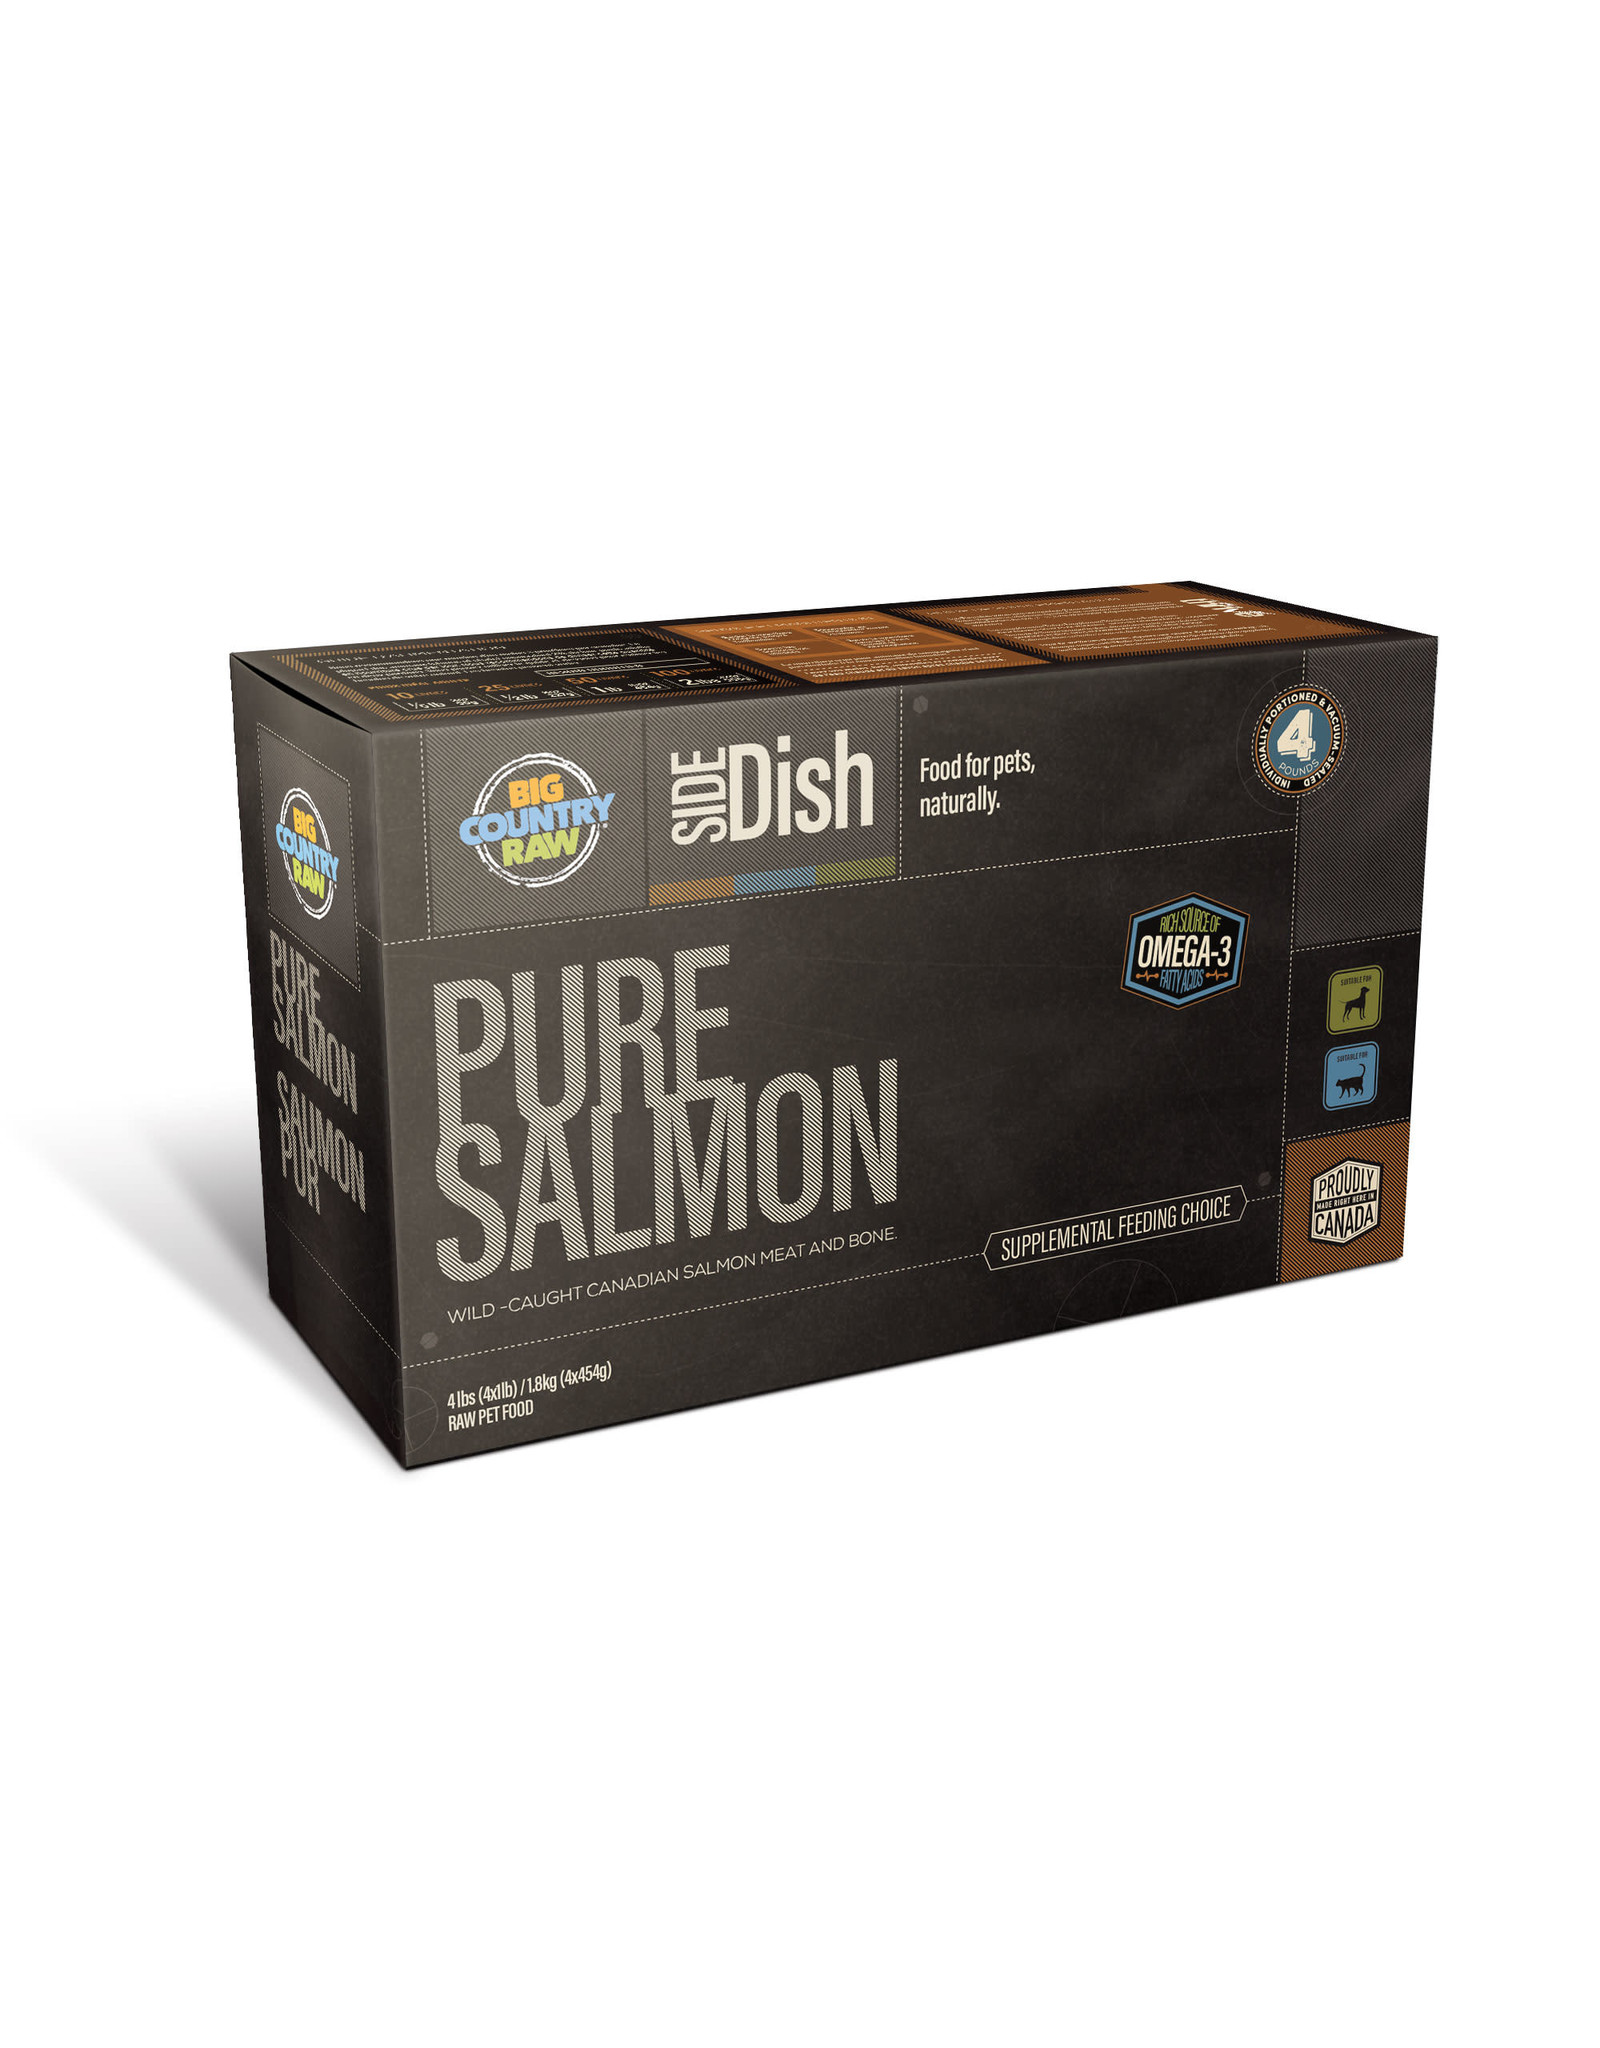 Big Country Raw BCR CARTON - 4x1lb - Pure Salmon